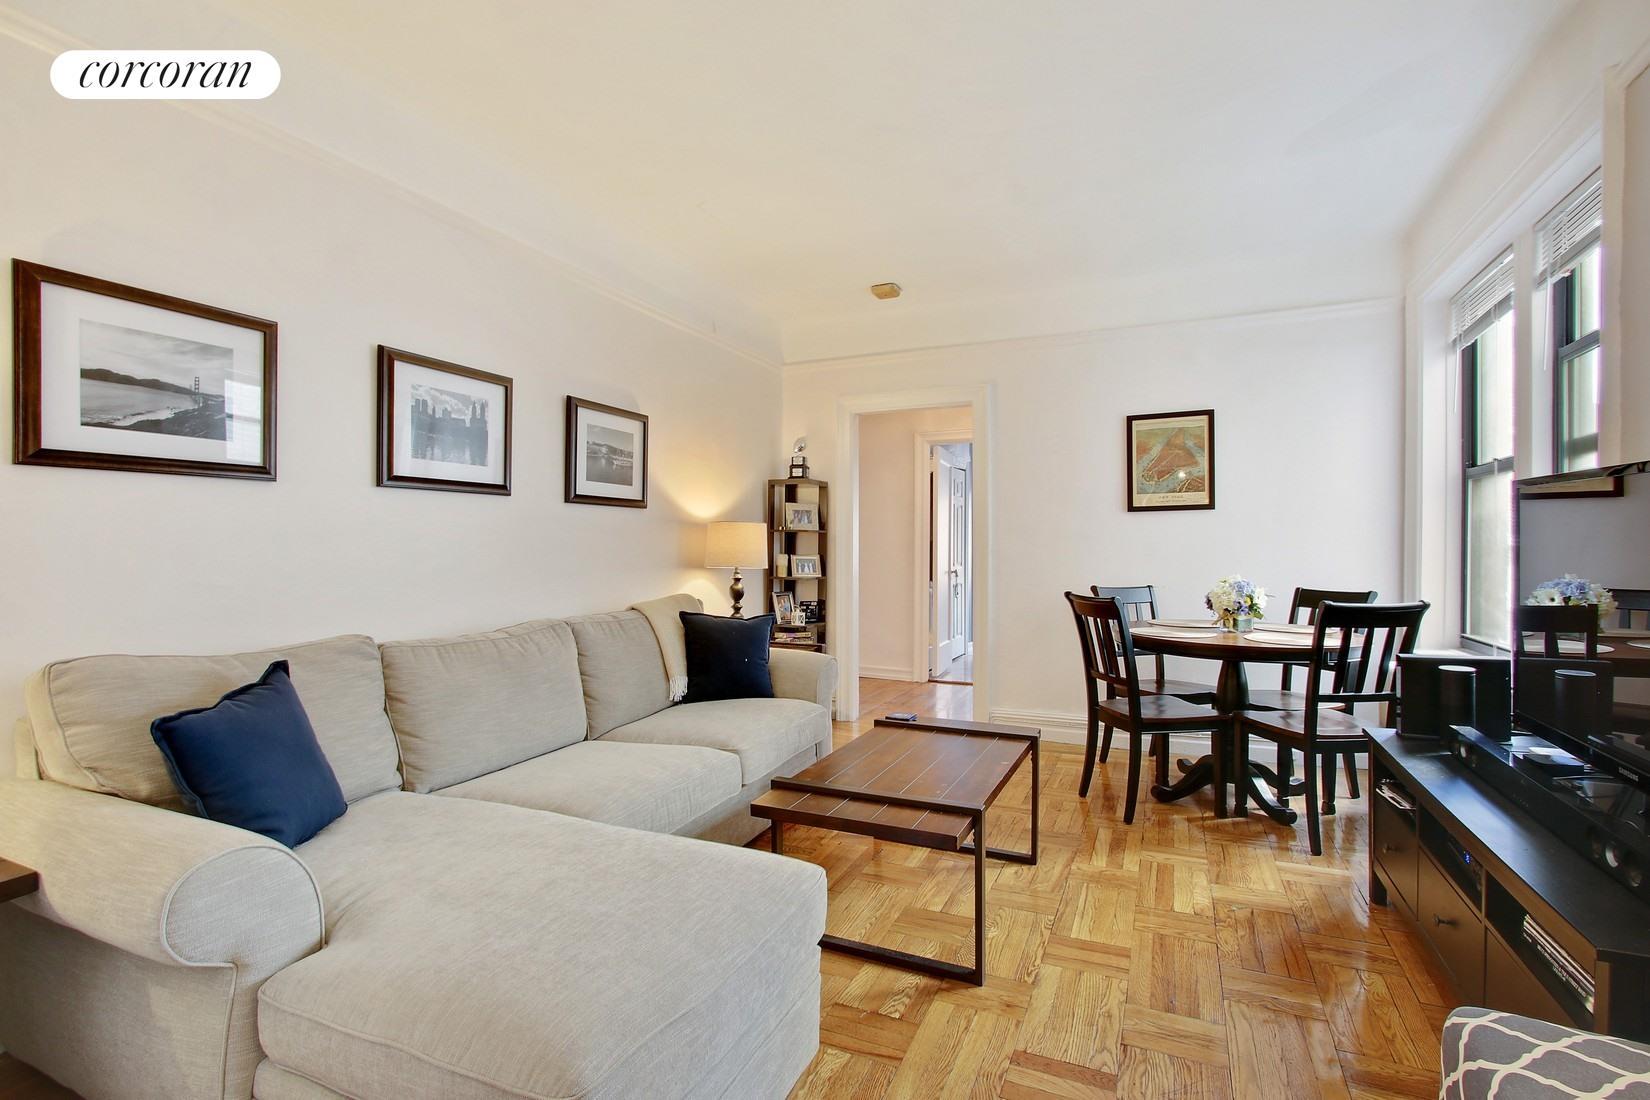 222 East 82nd Street, 4D, Living Room With 9 Foot Ceilings